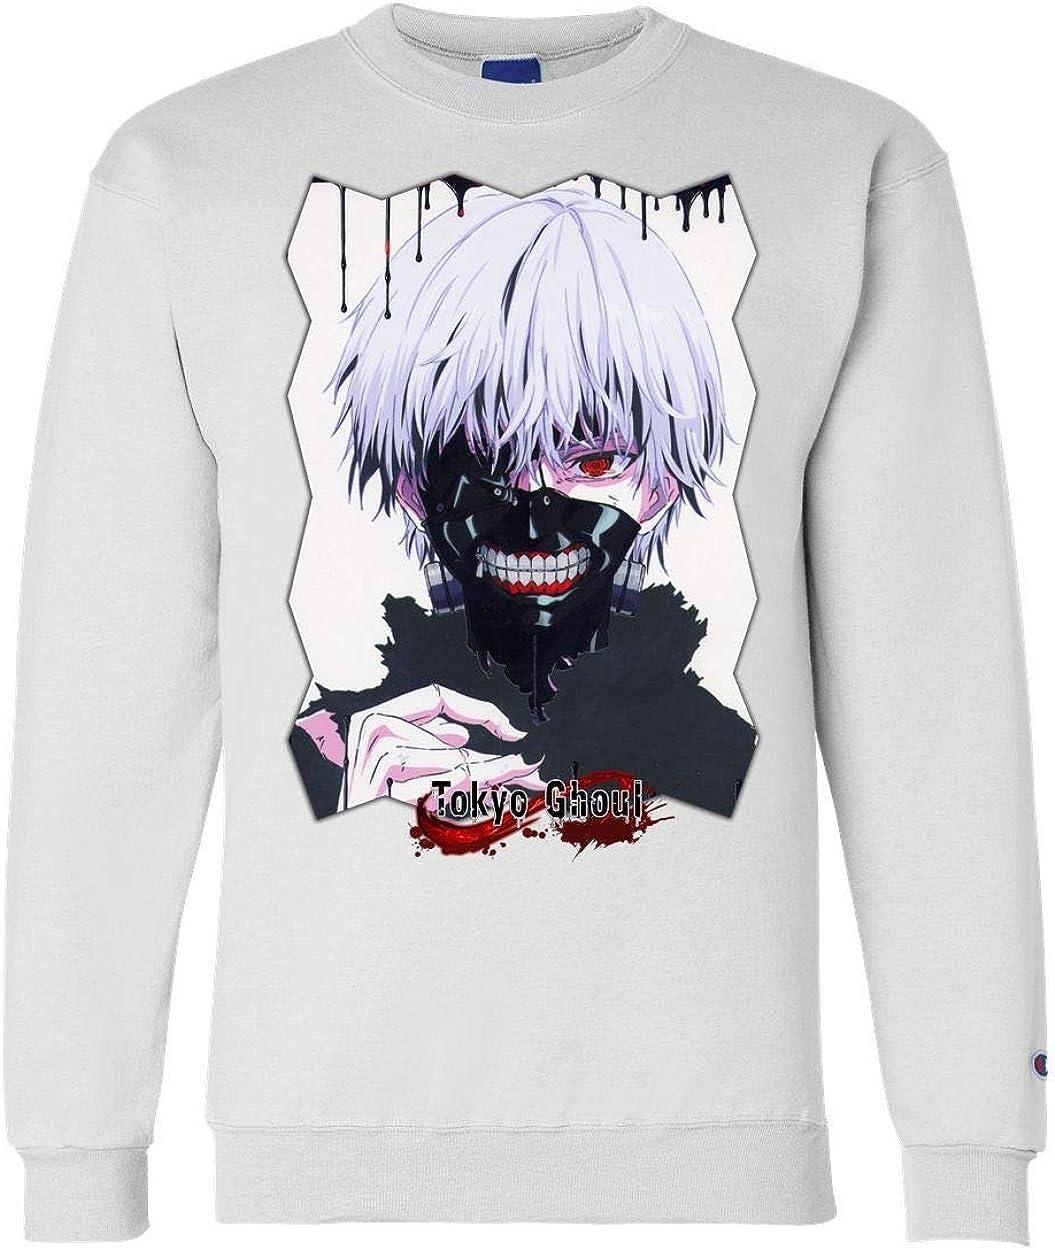 Tokyo Ghoul Anime 2021 Attention brand autumn and winter new Unisex Champion Sweatshirt TokG CRW Crewneck